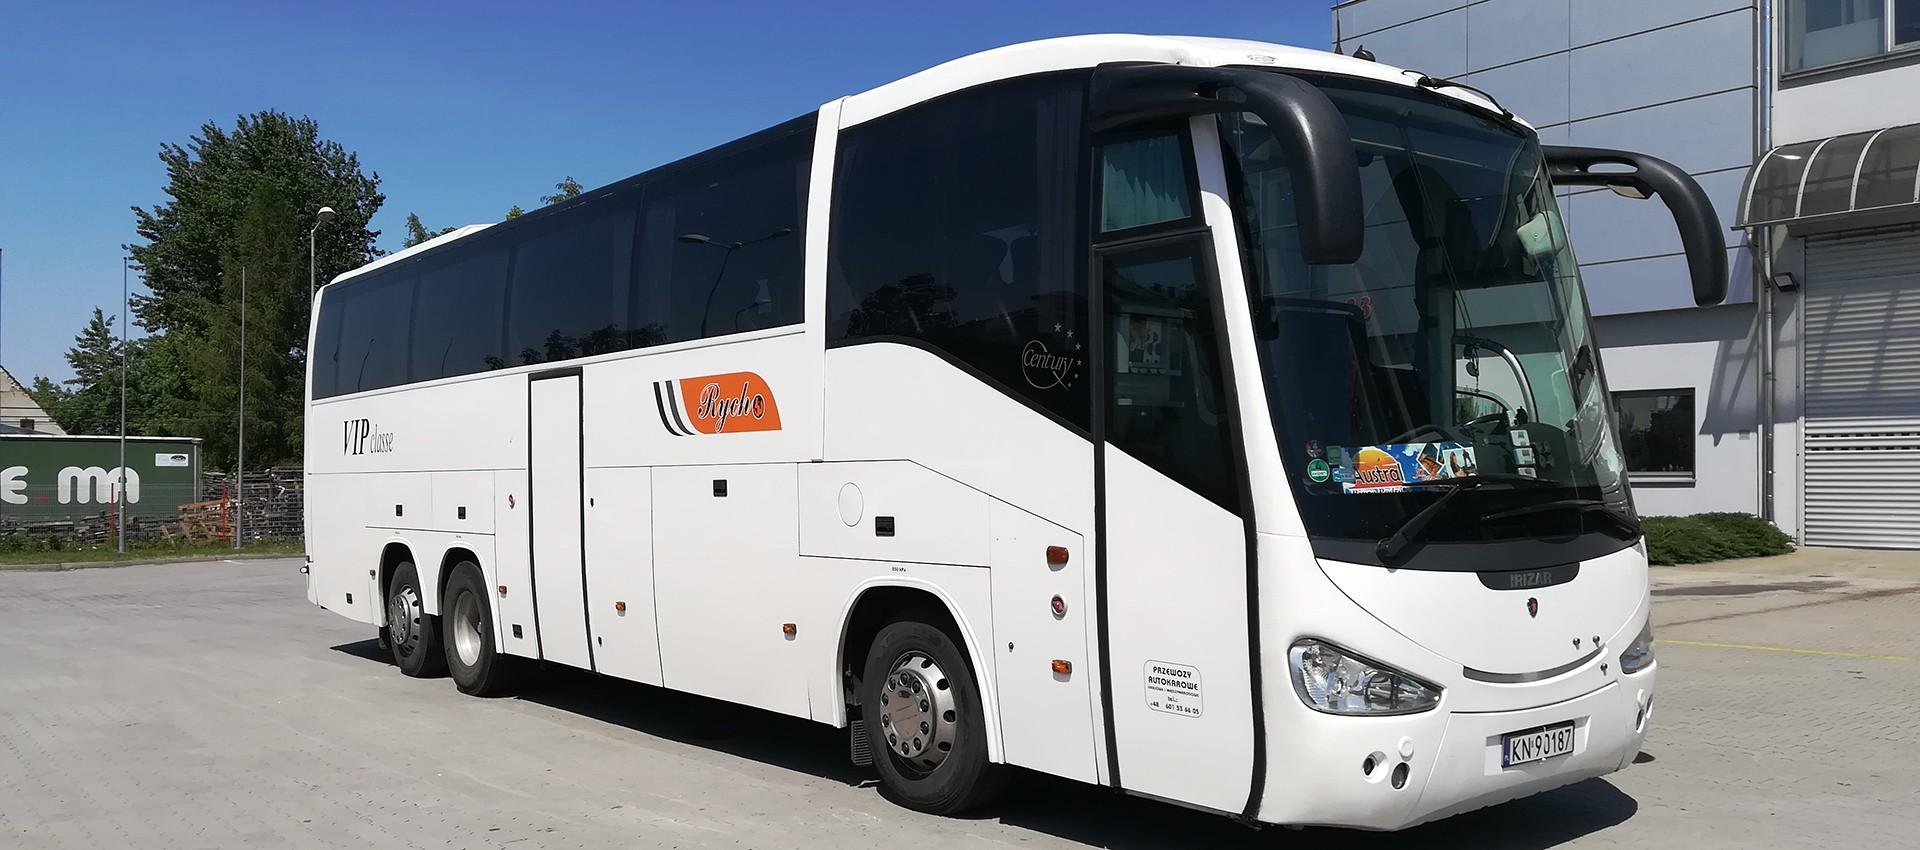 SCANIA IRIZAR 52 VIP